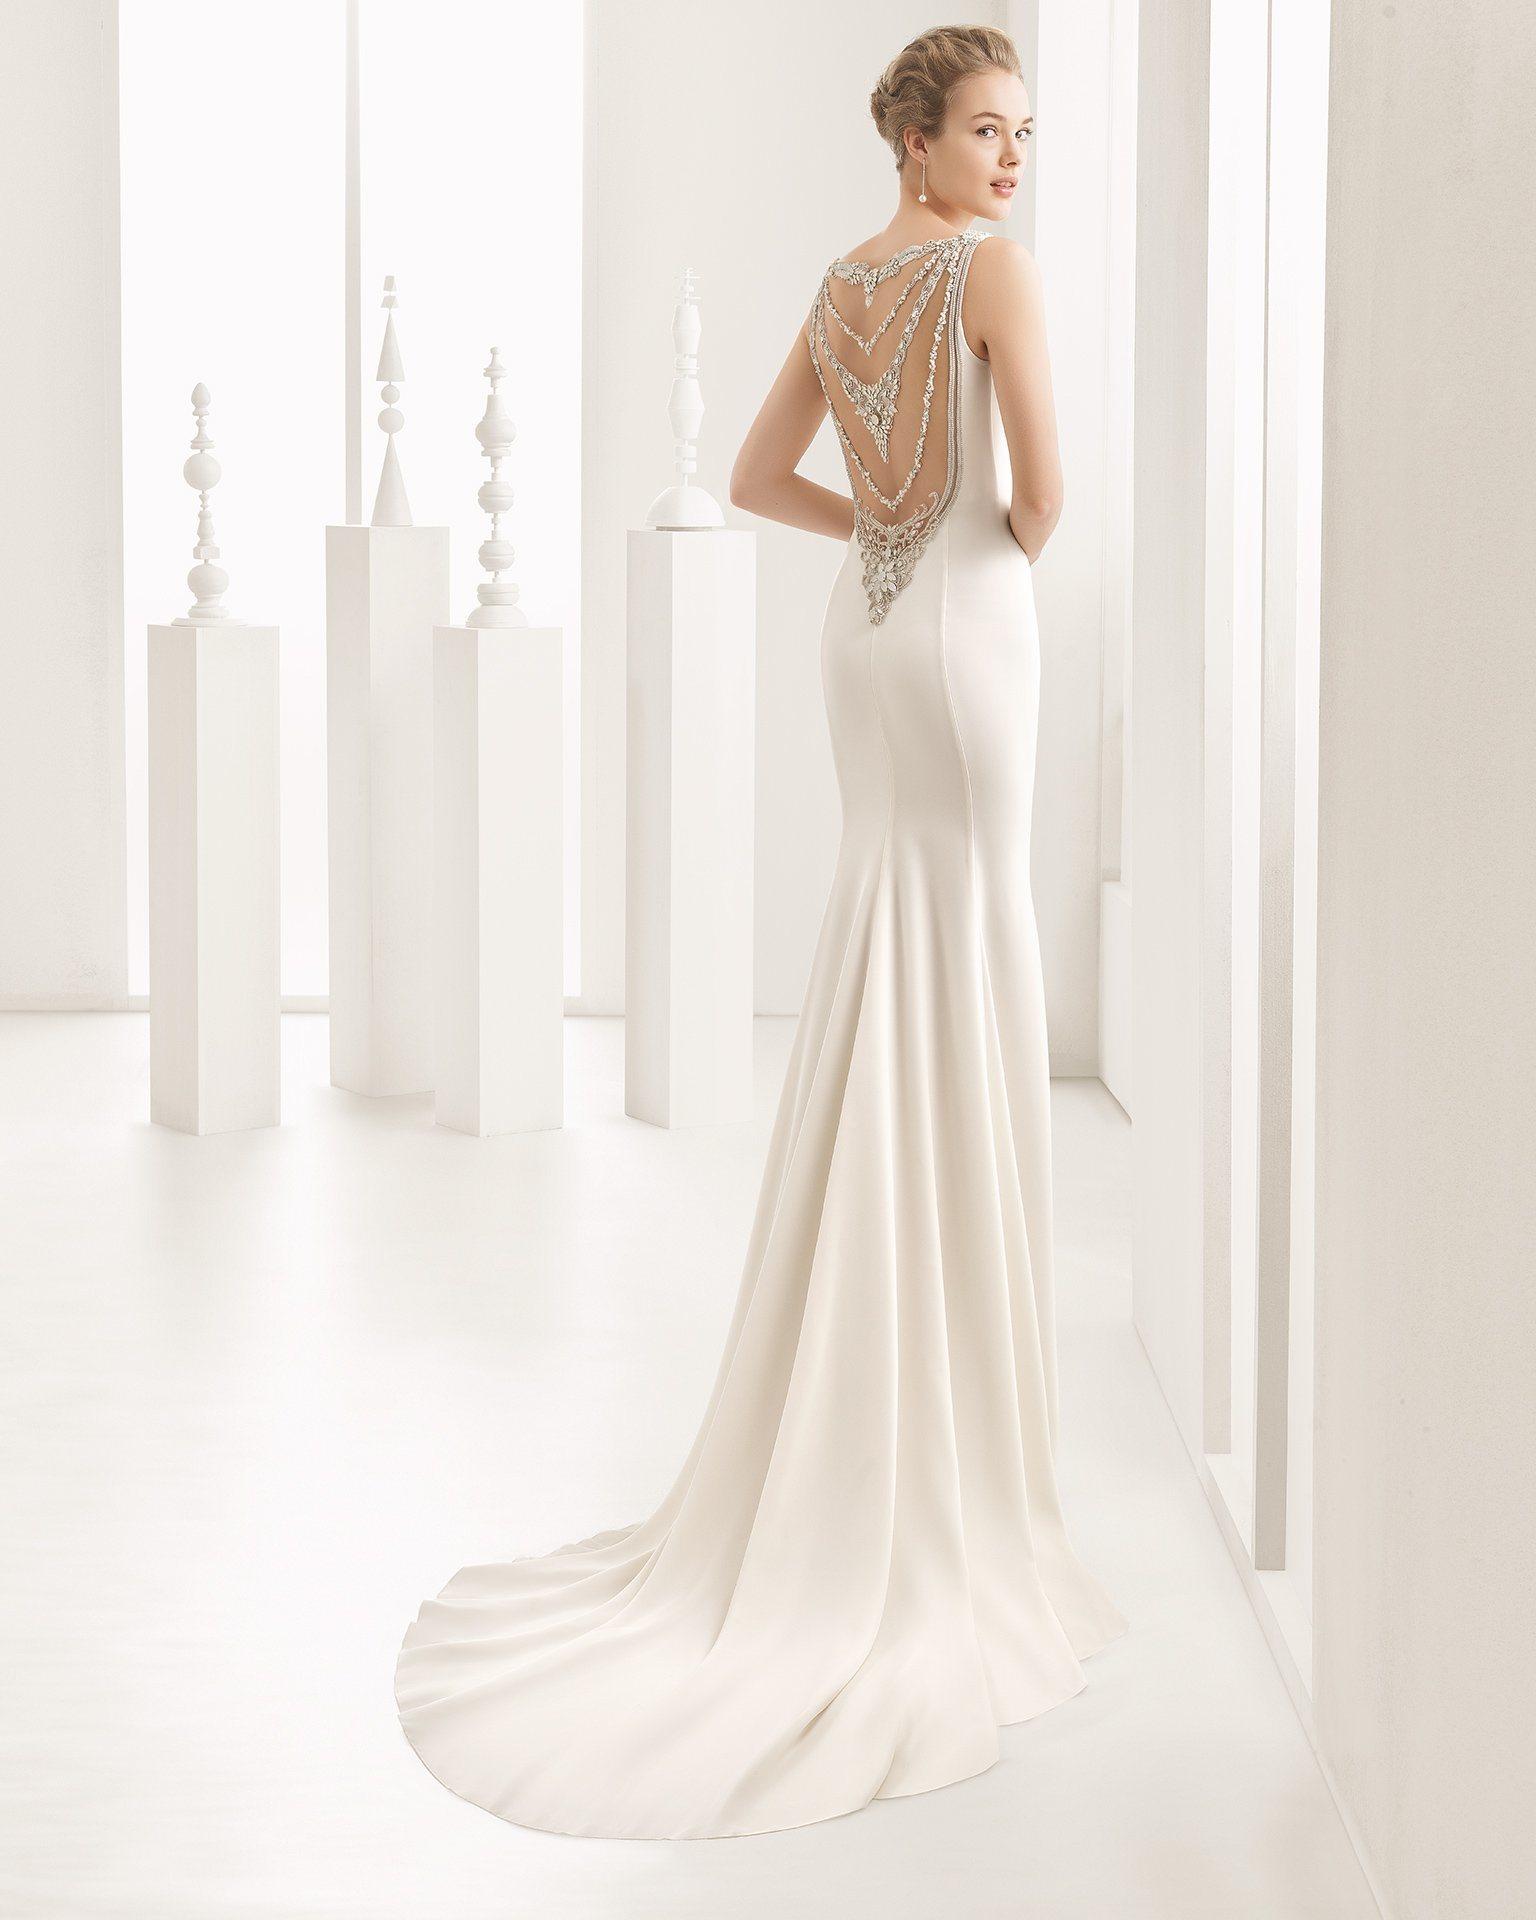 China Amelie Rocky 2018 Satin Sexy Backless Wedding Gown Mermaid